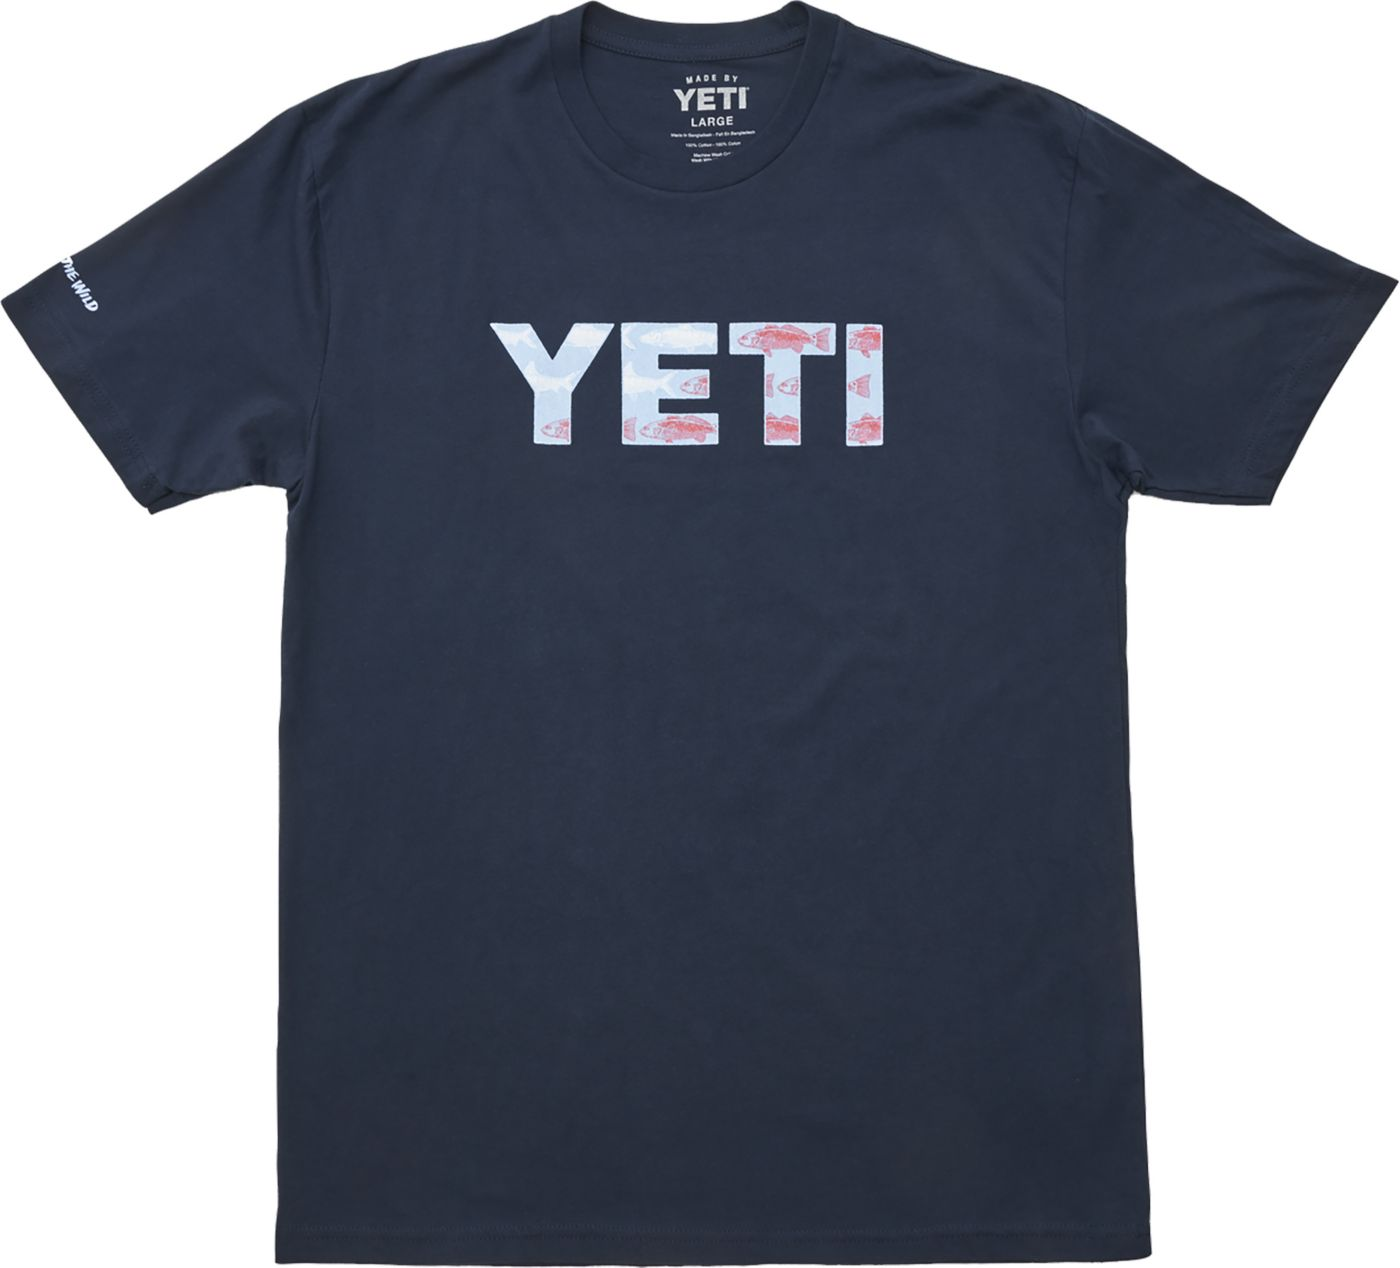 YETI Men's USA T-Shirt